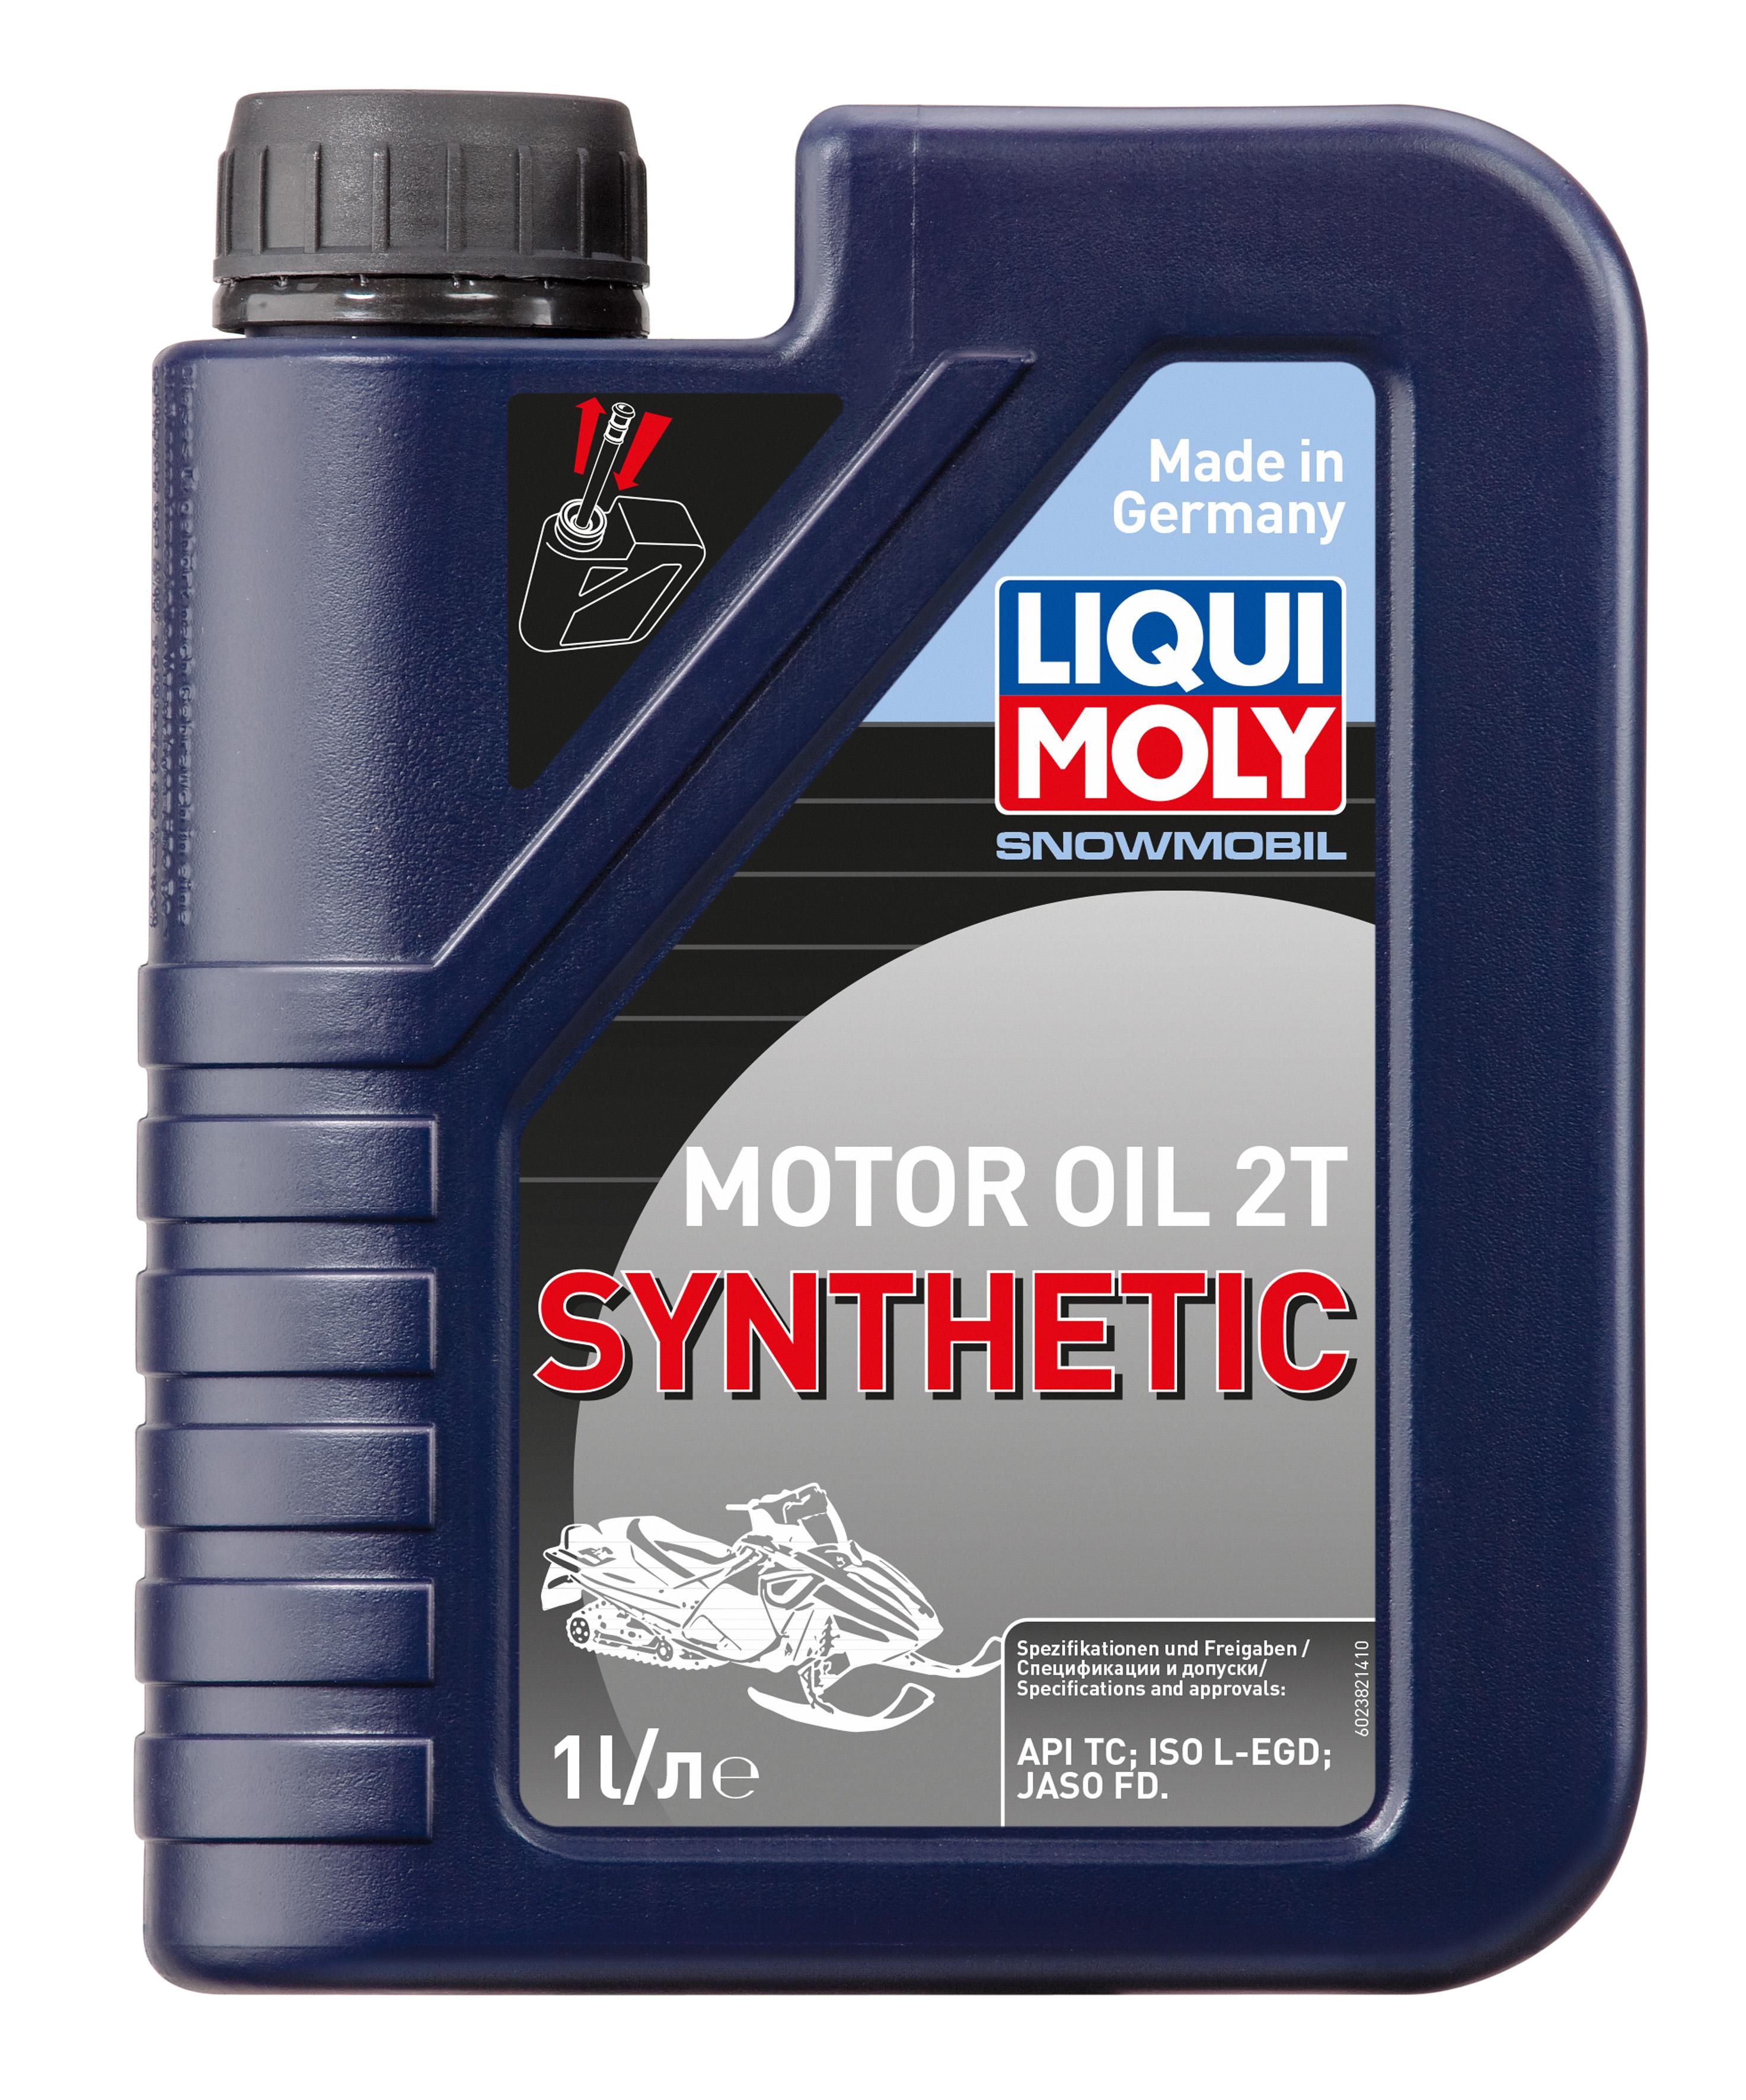 Масло моторное Liqui Moly Snowmobil Motoroil 2T Synthetic